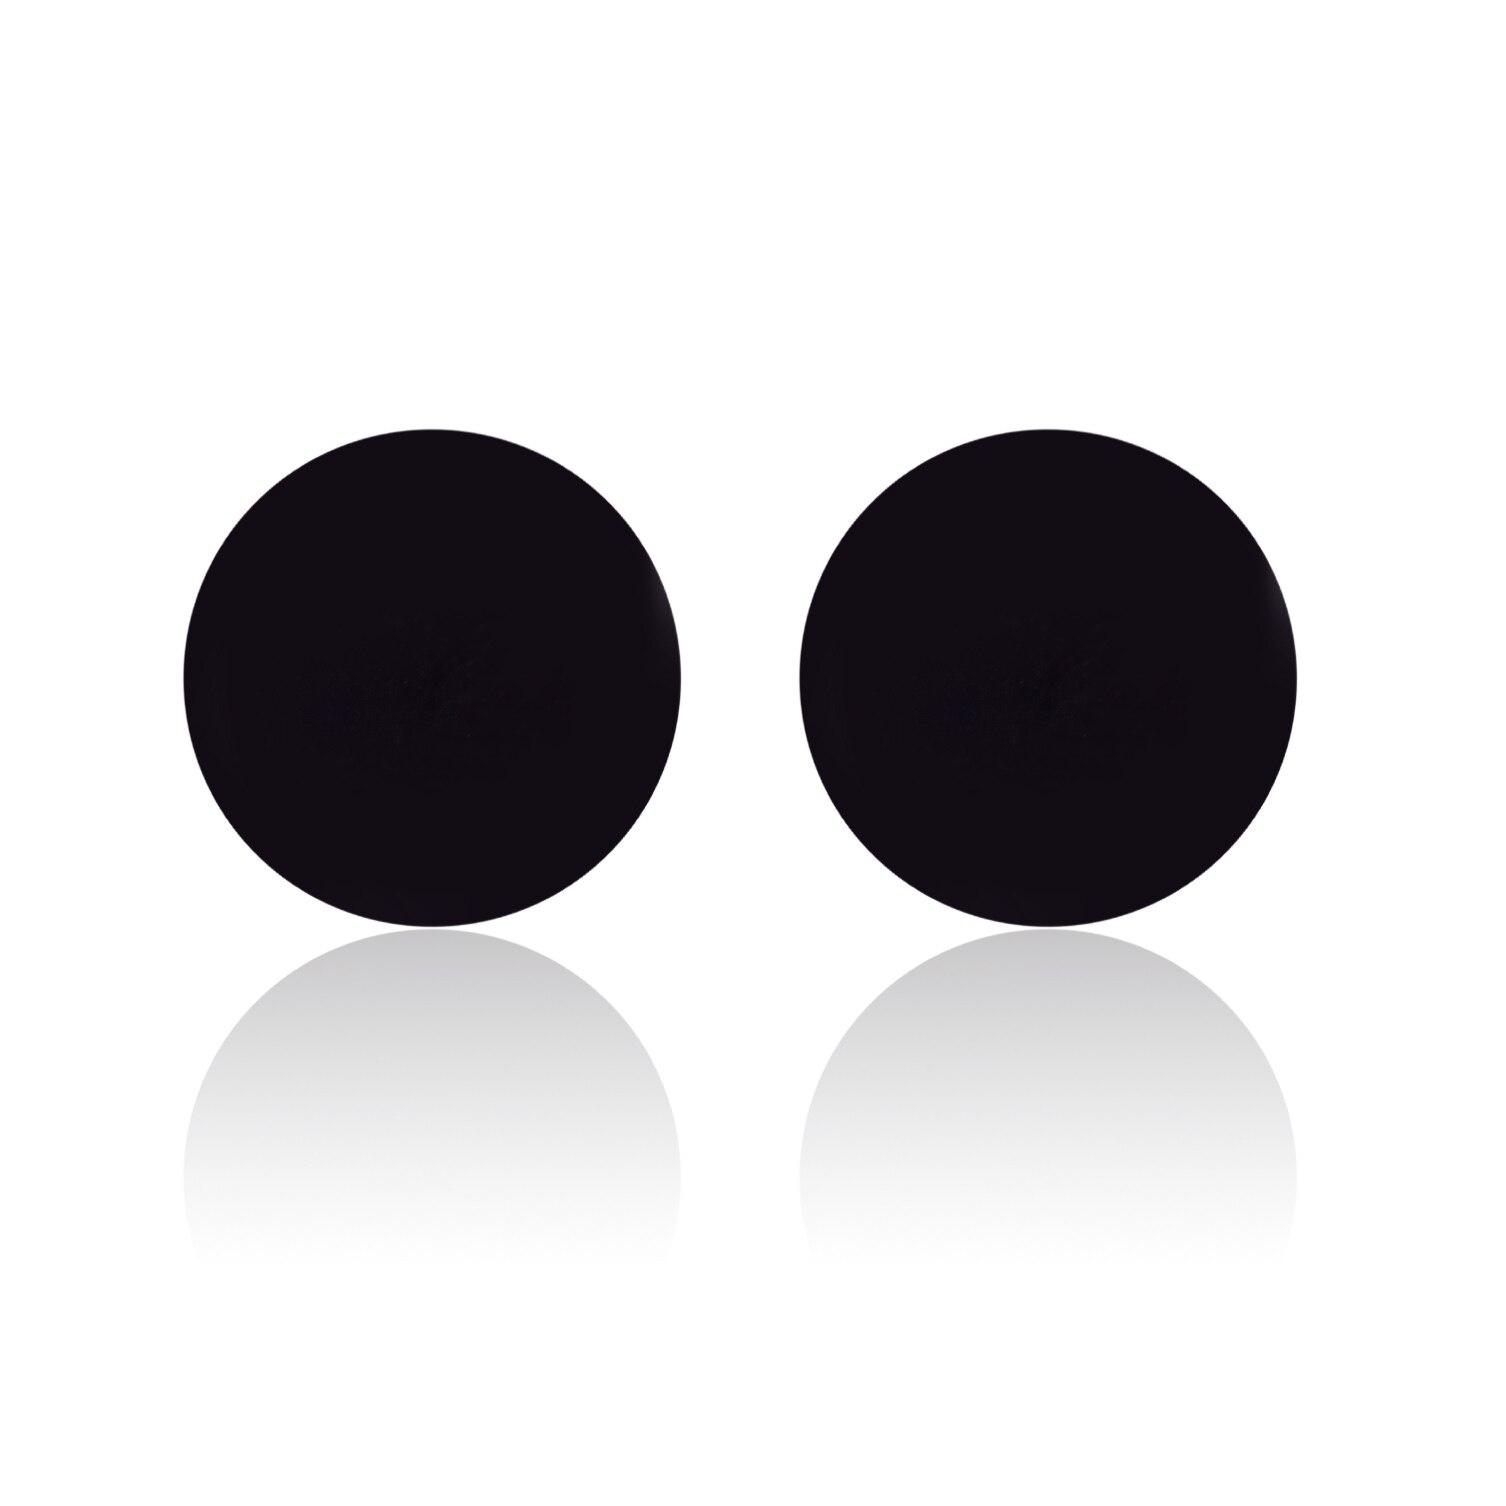 Simple Stainless Steel Round Earrings Geometric Women Men Hip hop Cylinder Stud Earring Minimalist J